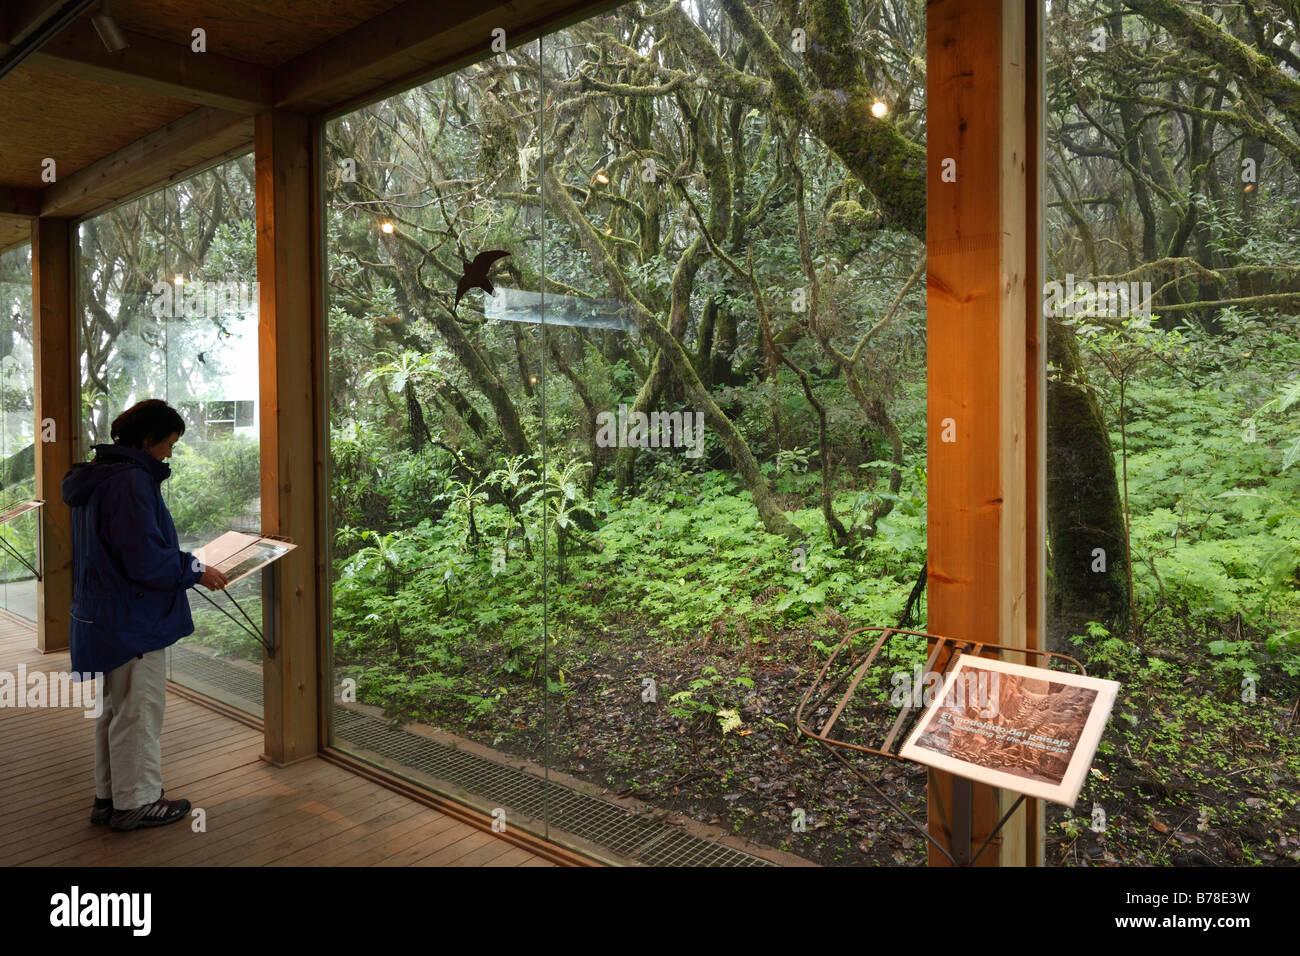 Information centre Laguna Grande in a cloud forest, Garajonay National Park, La Gomera, Canary Islands, Spain, Europe - Stock Image